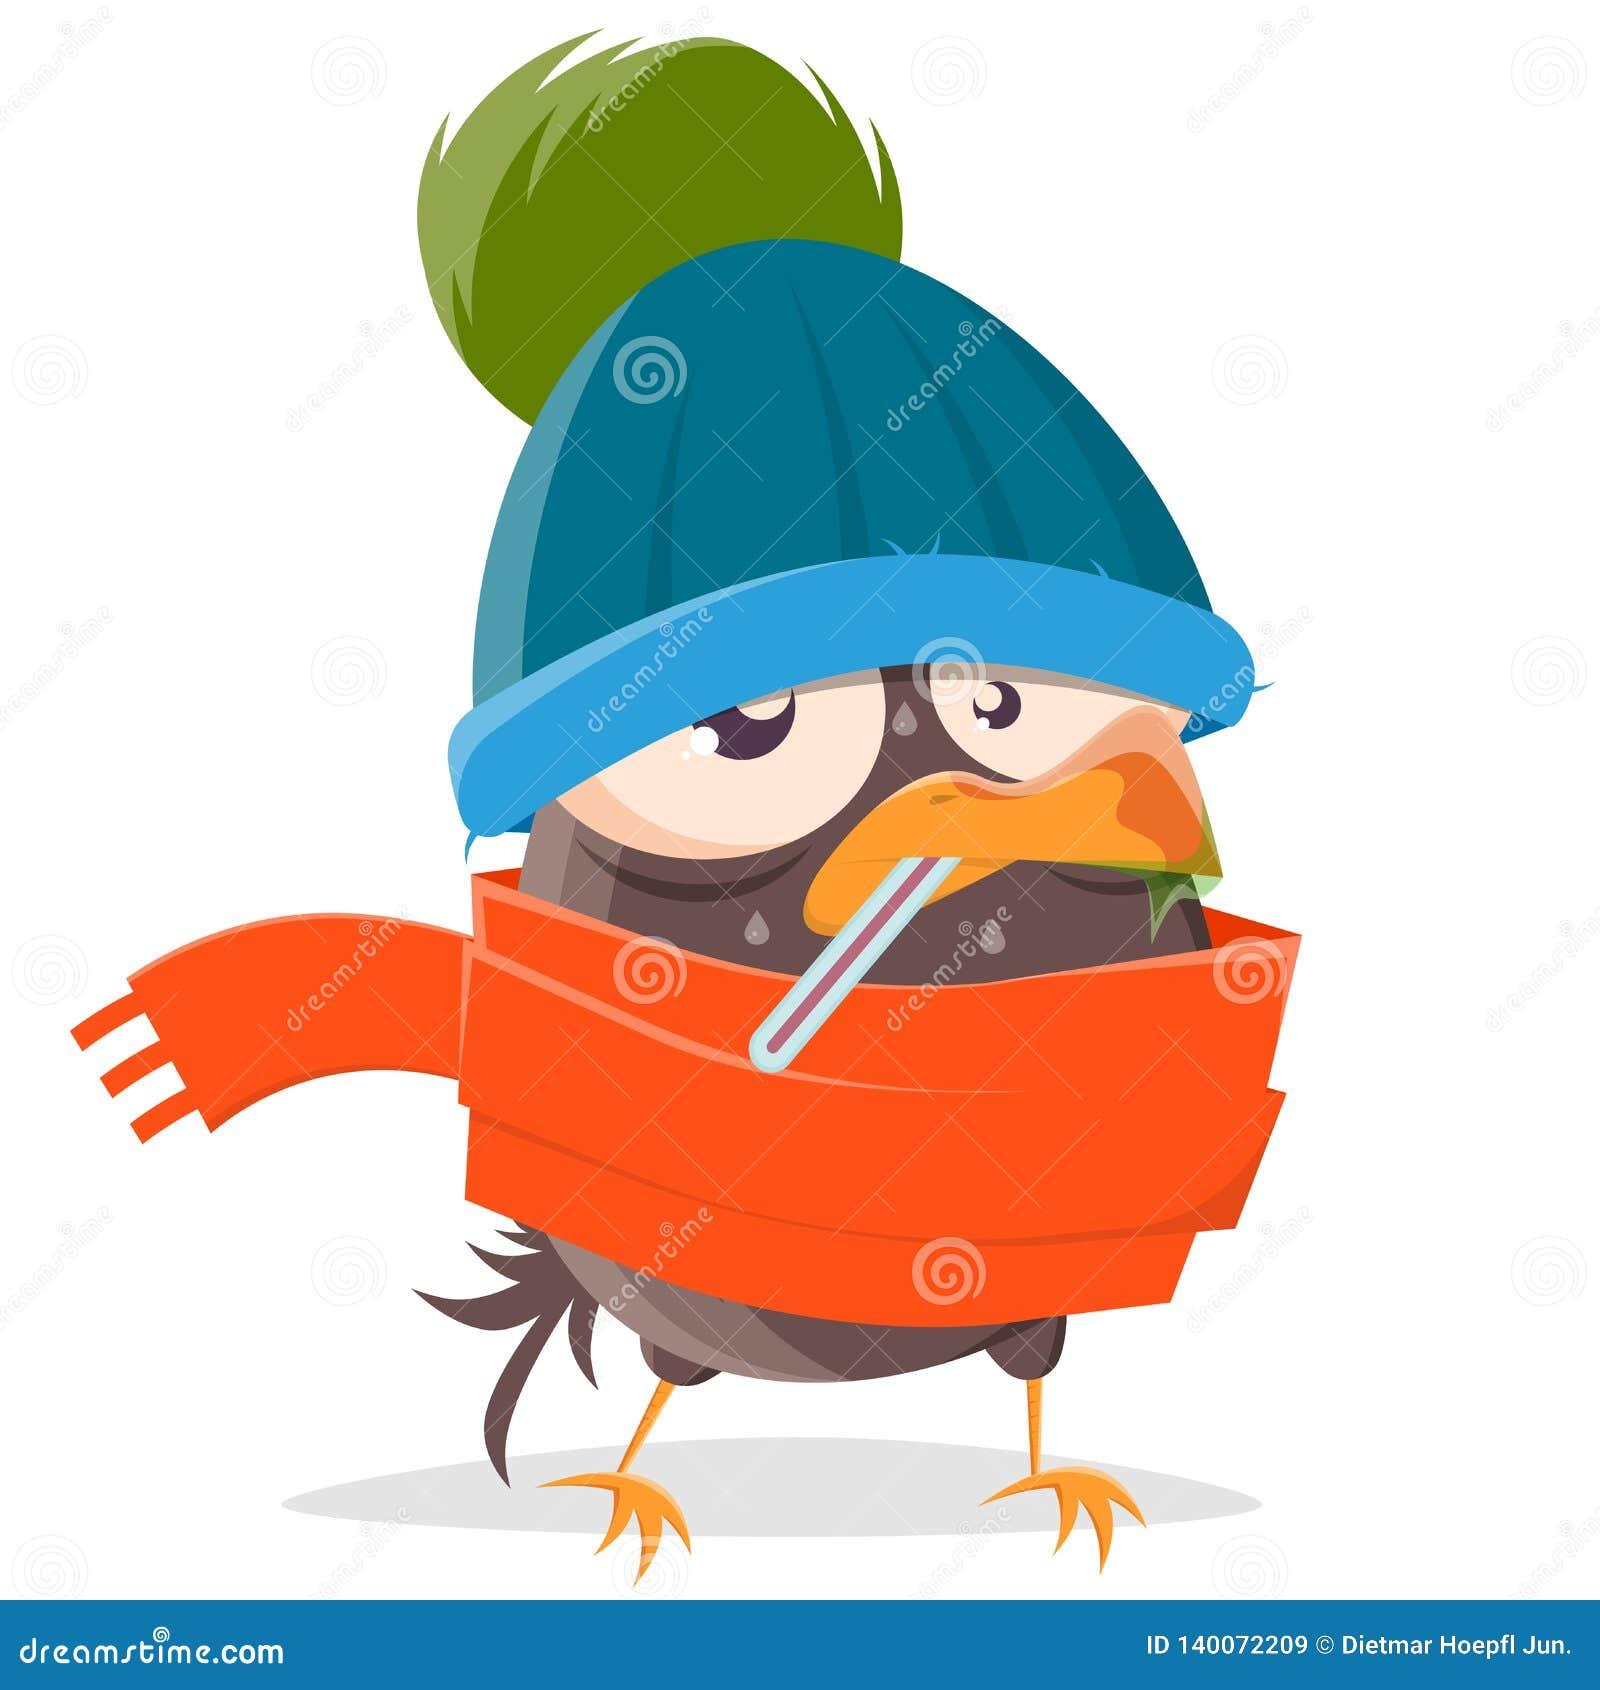 Cartoon bird is sick